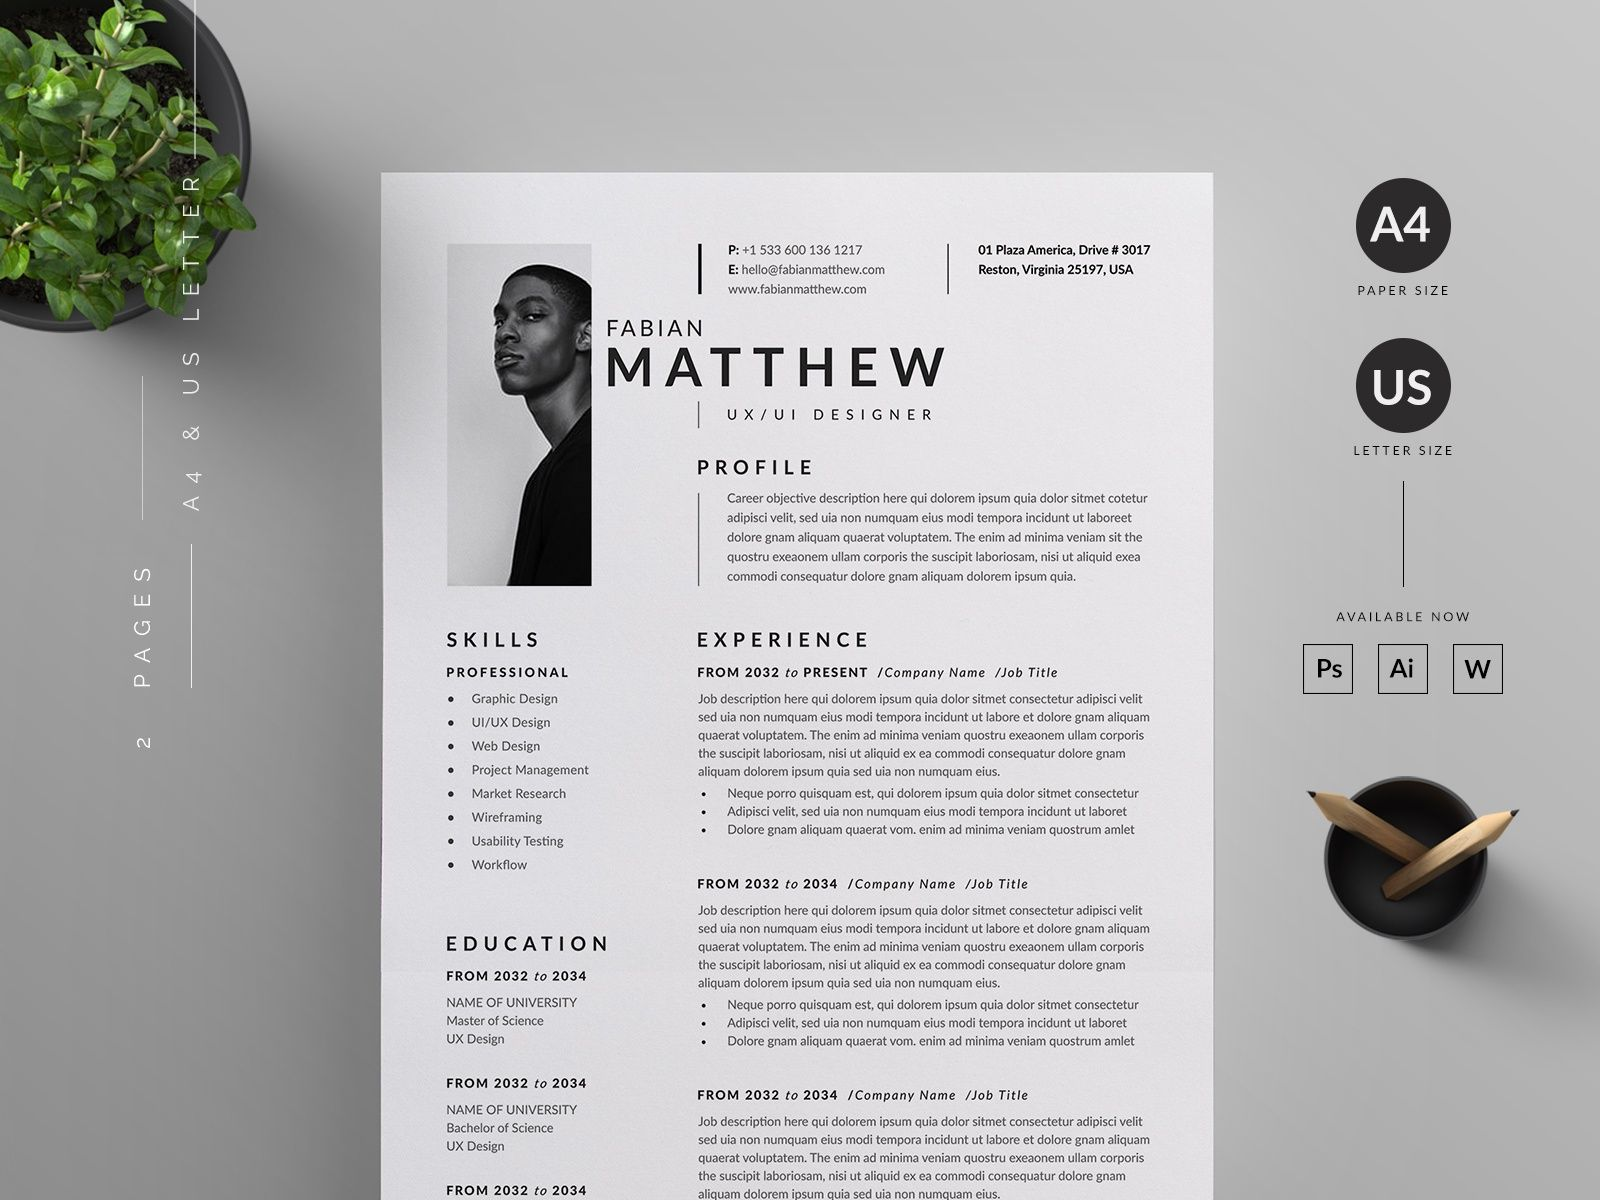 Resumecv in 2020 resume cv resume lettering